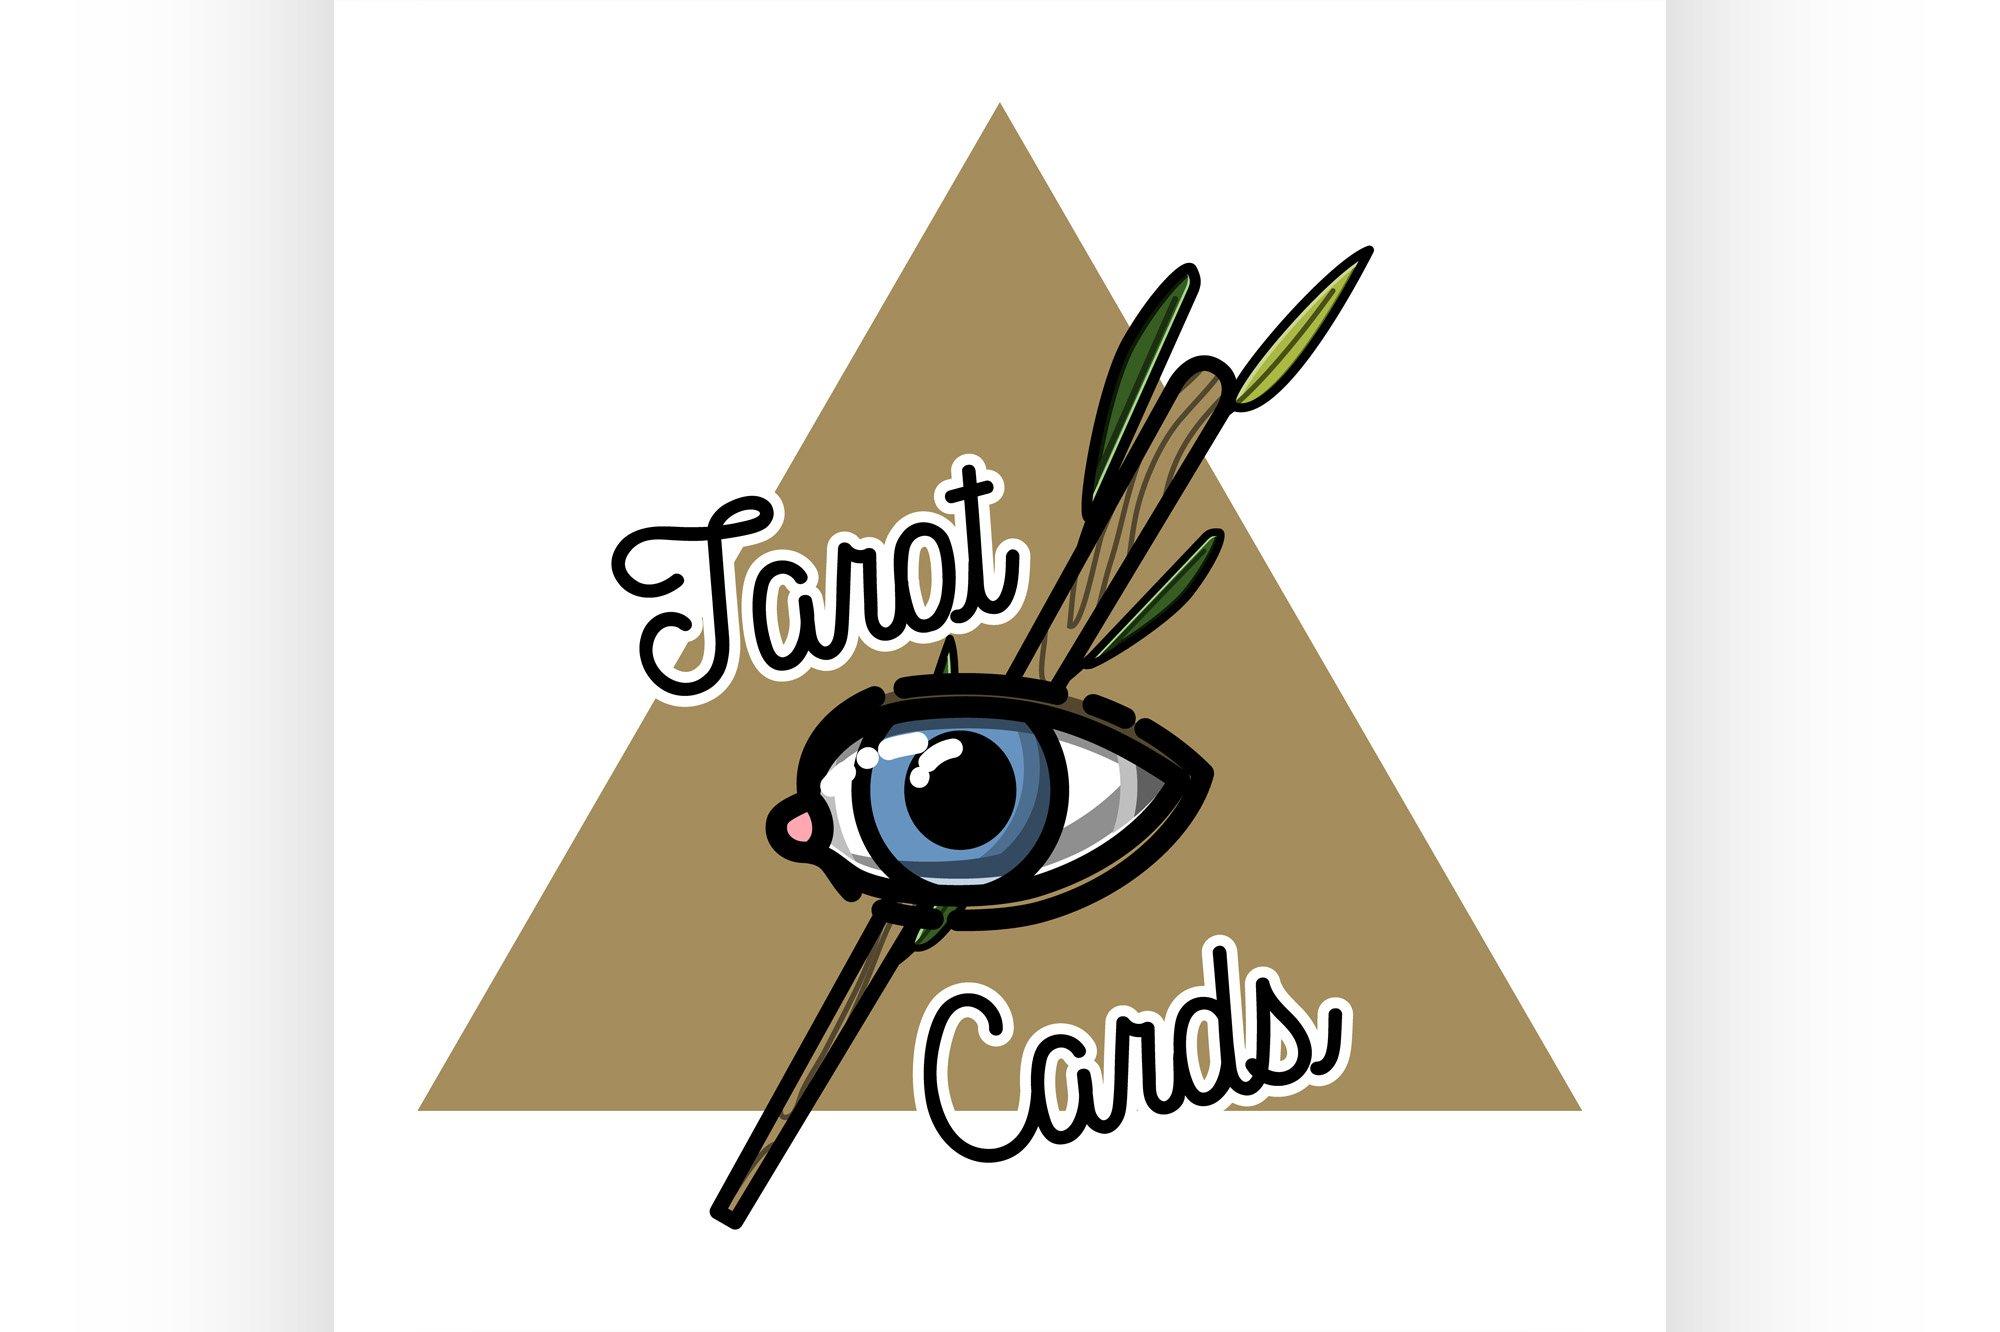 Color vintage tarot cards emblem example image 1